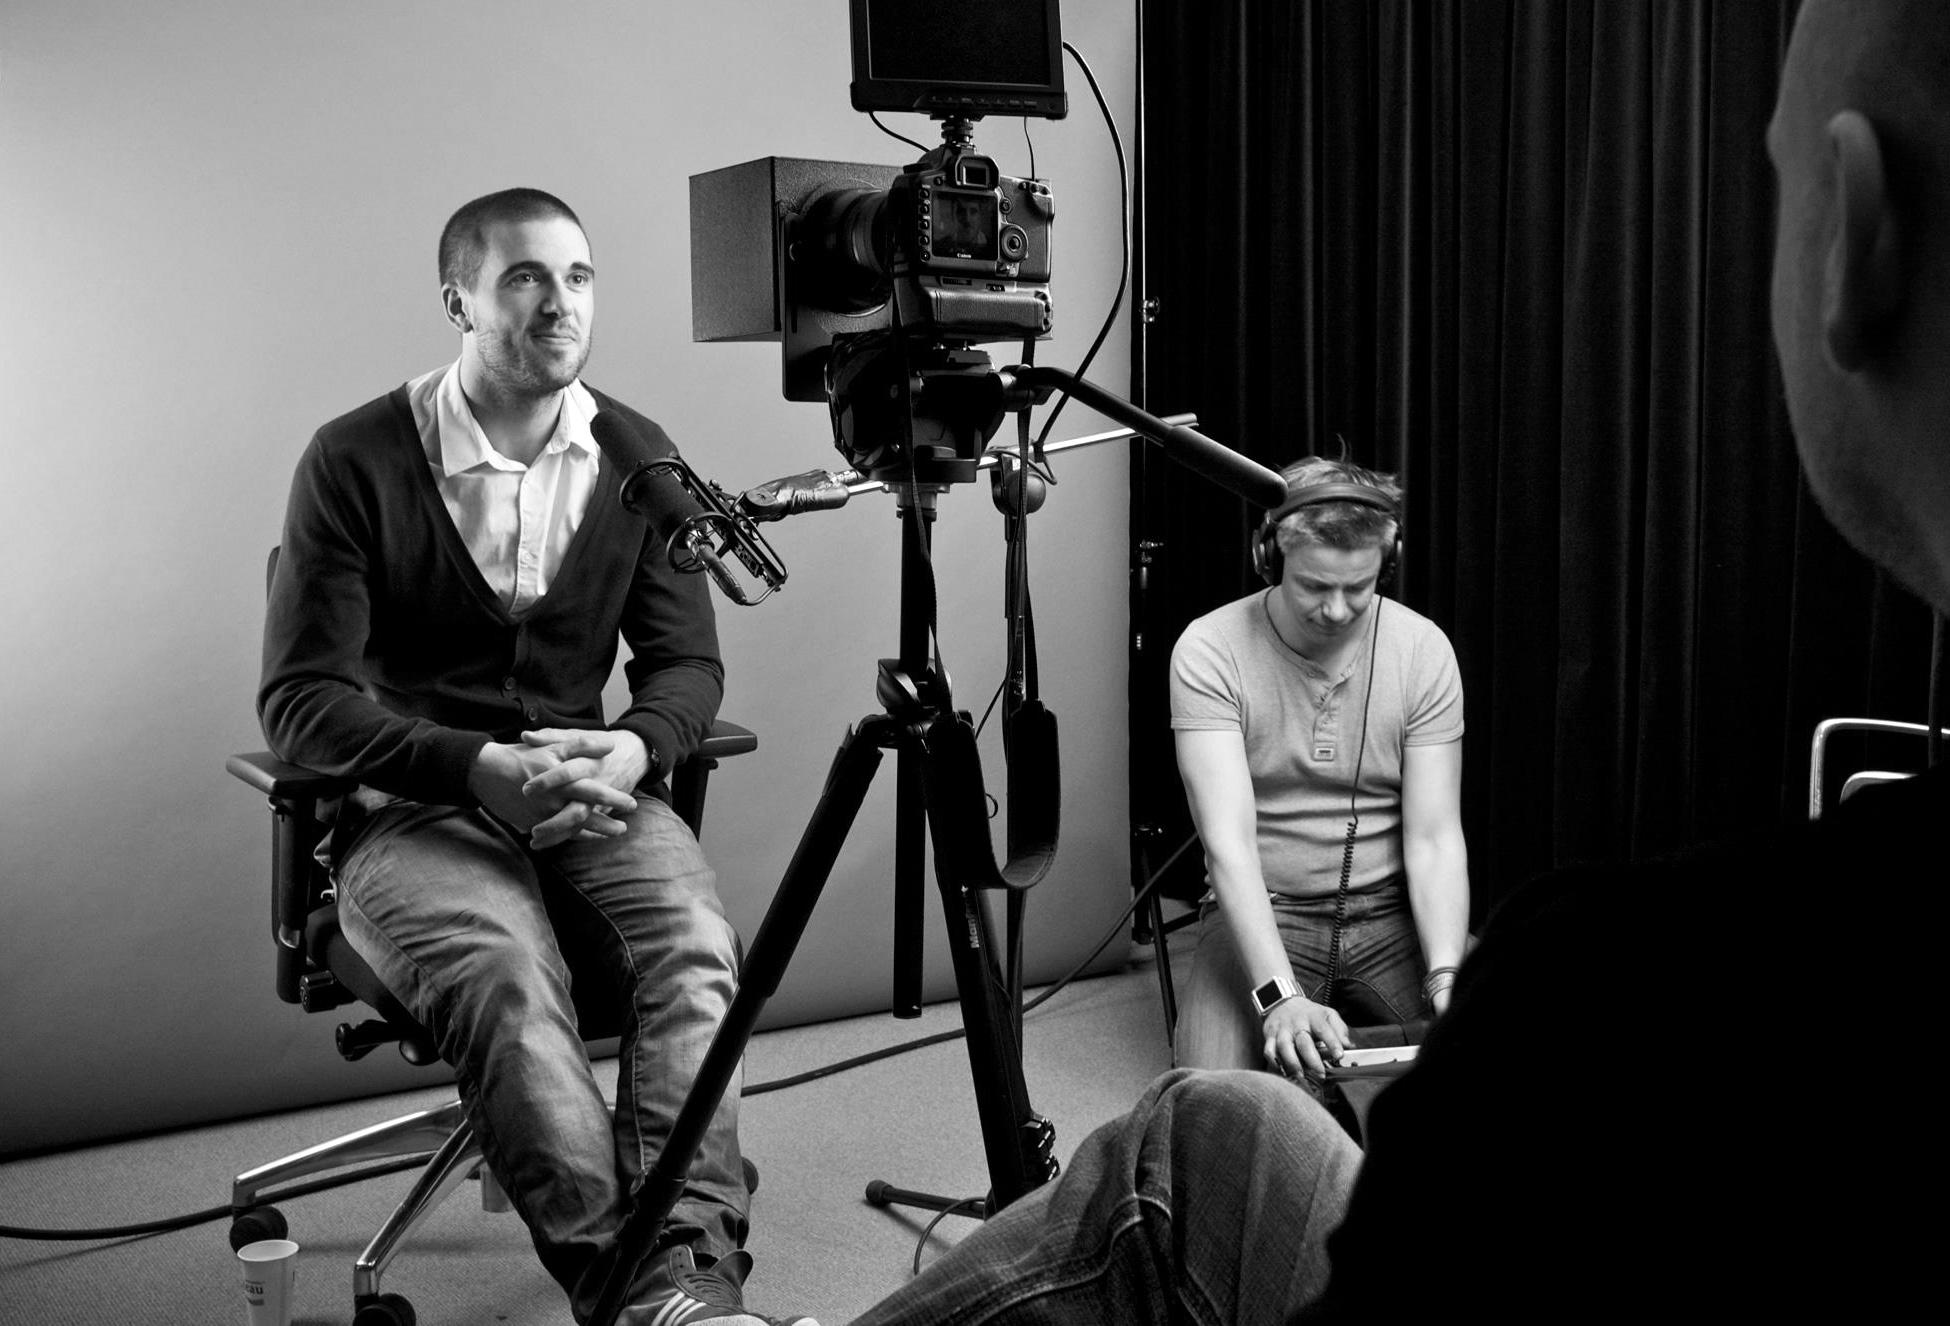 interview_visionclinics.jpg